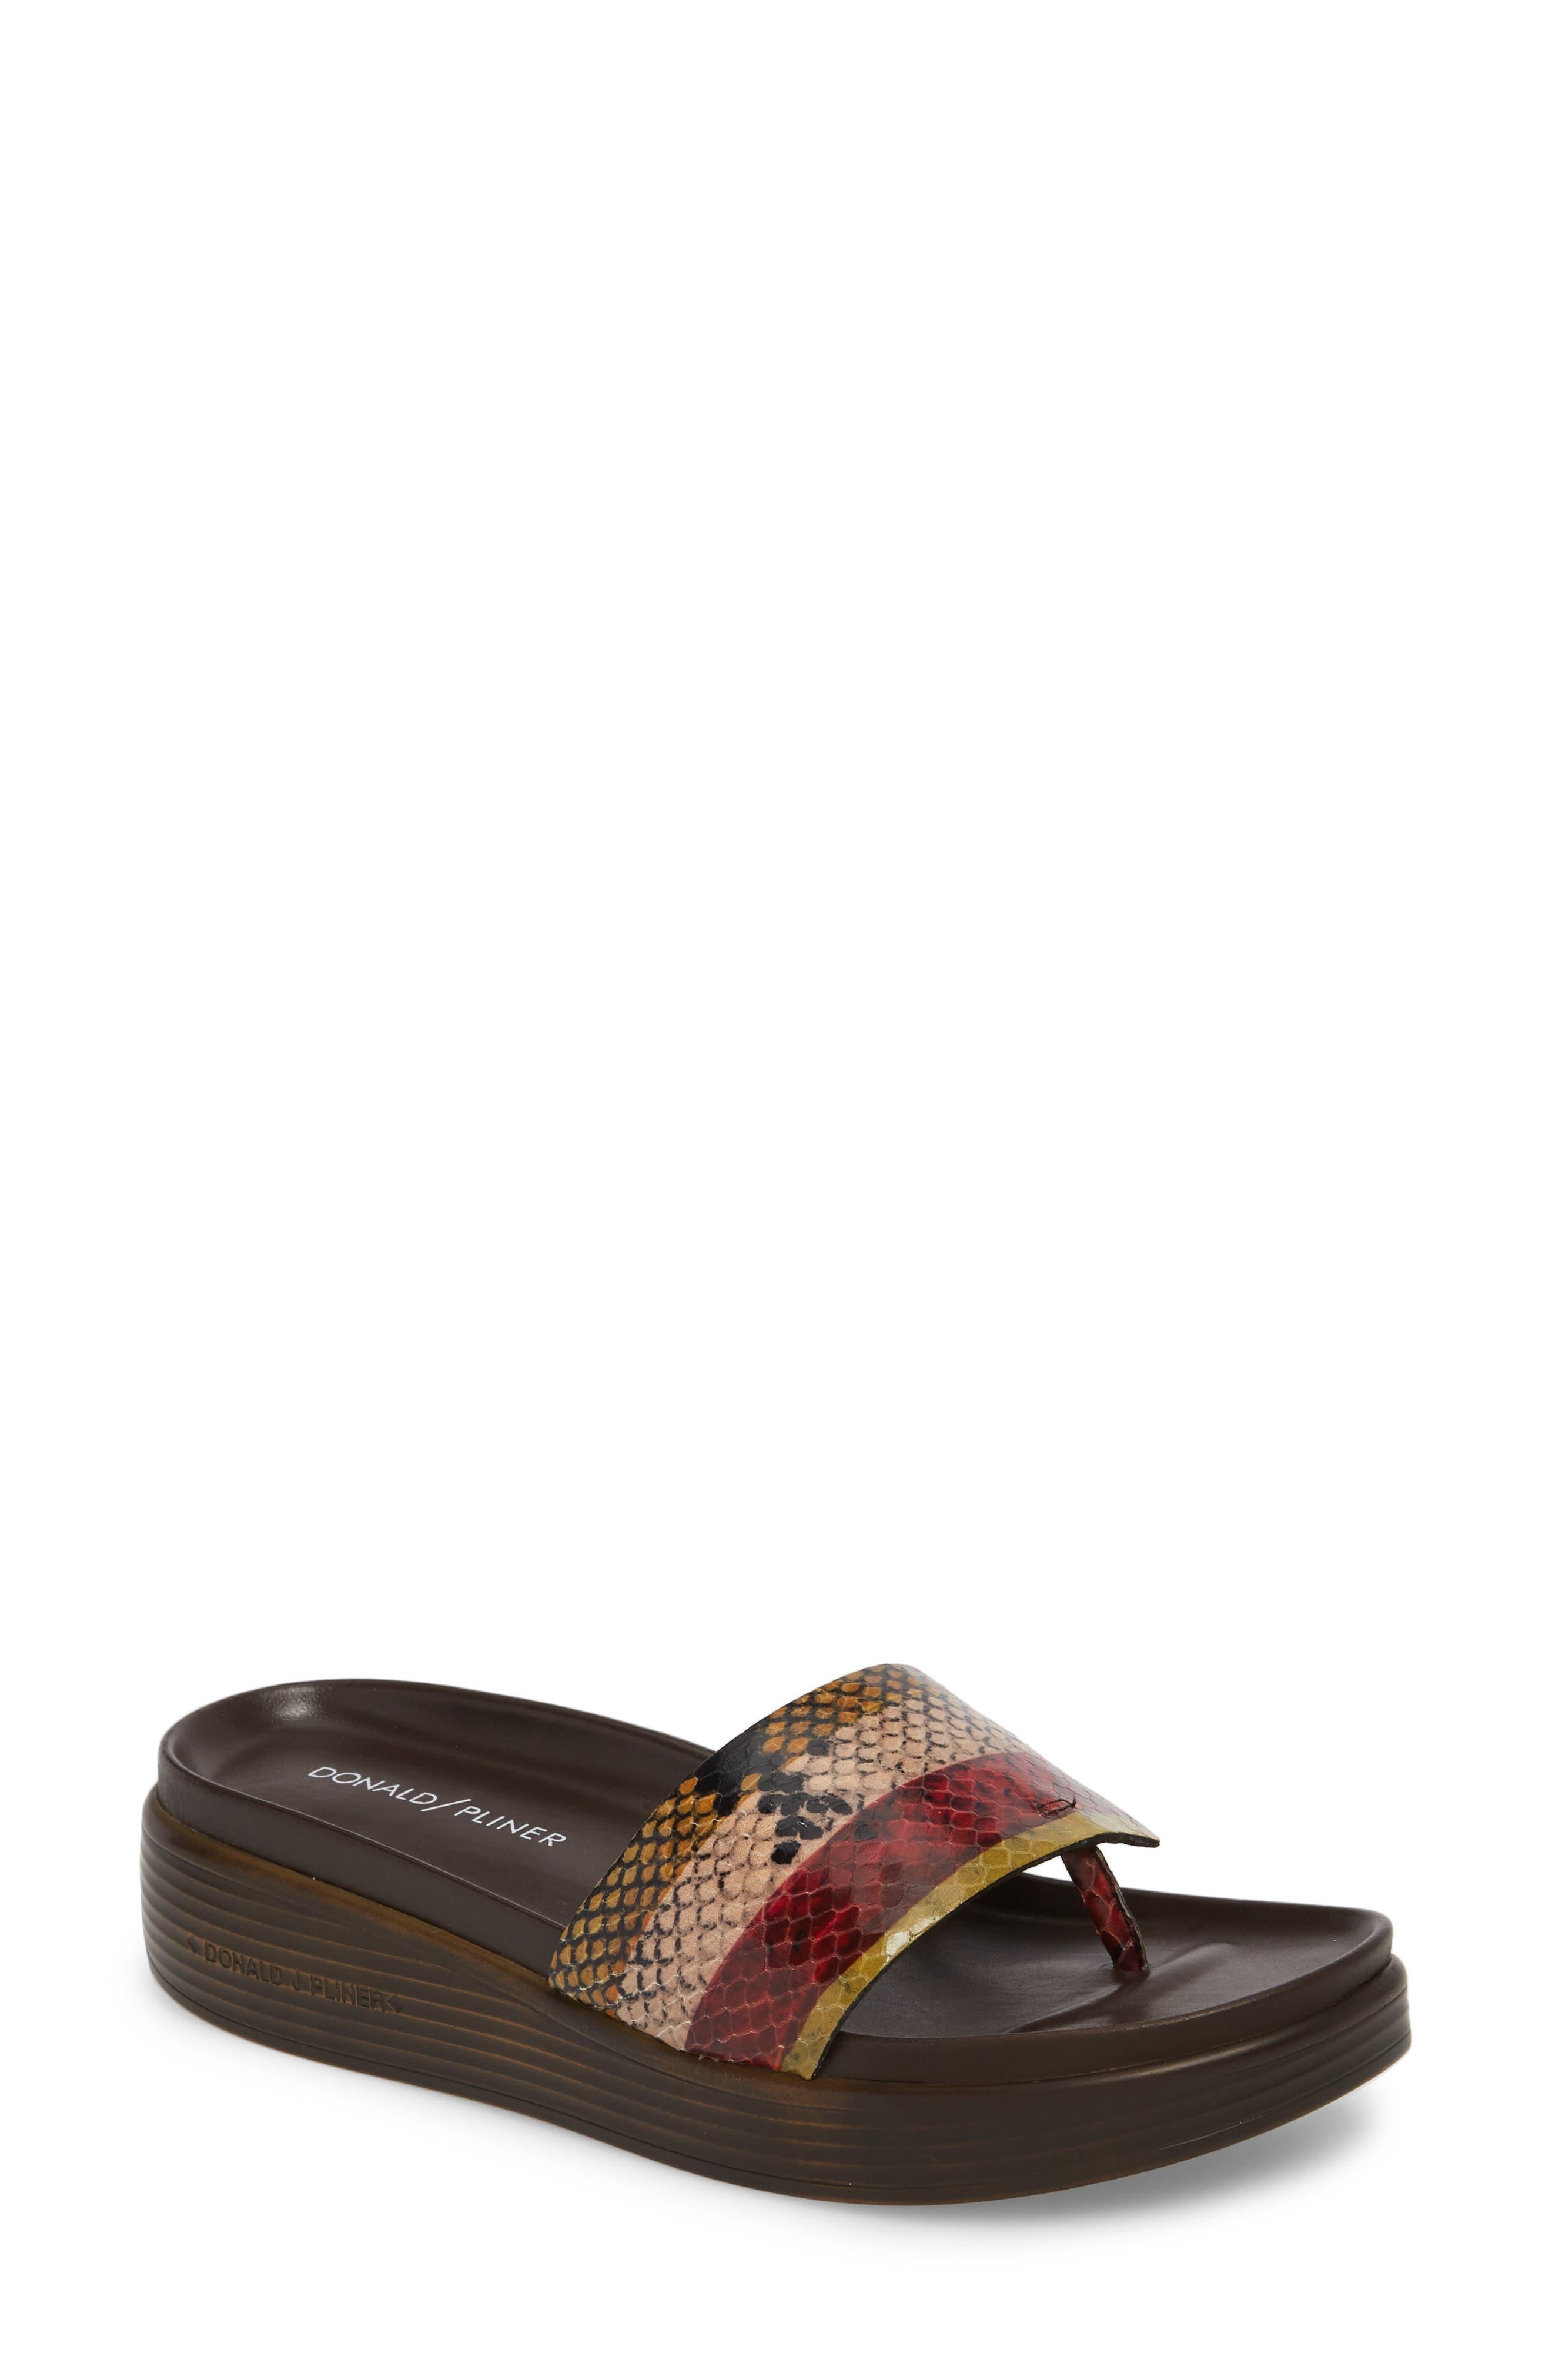 Fifi Slide Sandal,                             Main thumbnail 1, color,                             Fawn Leather